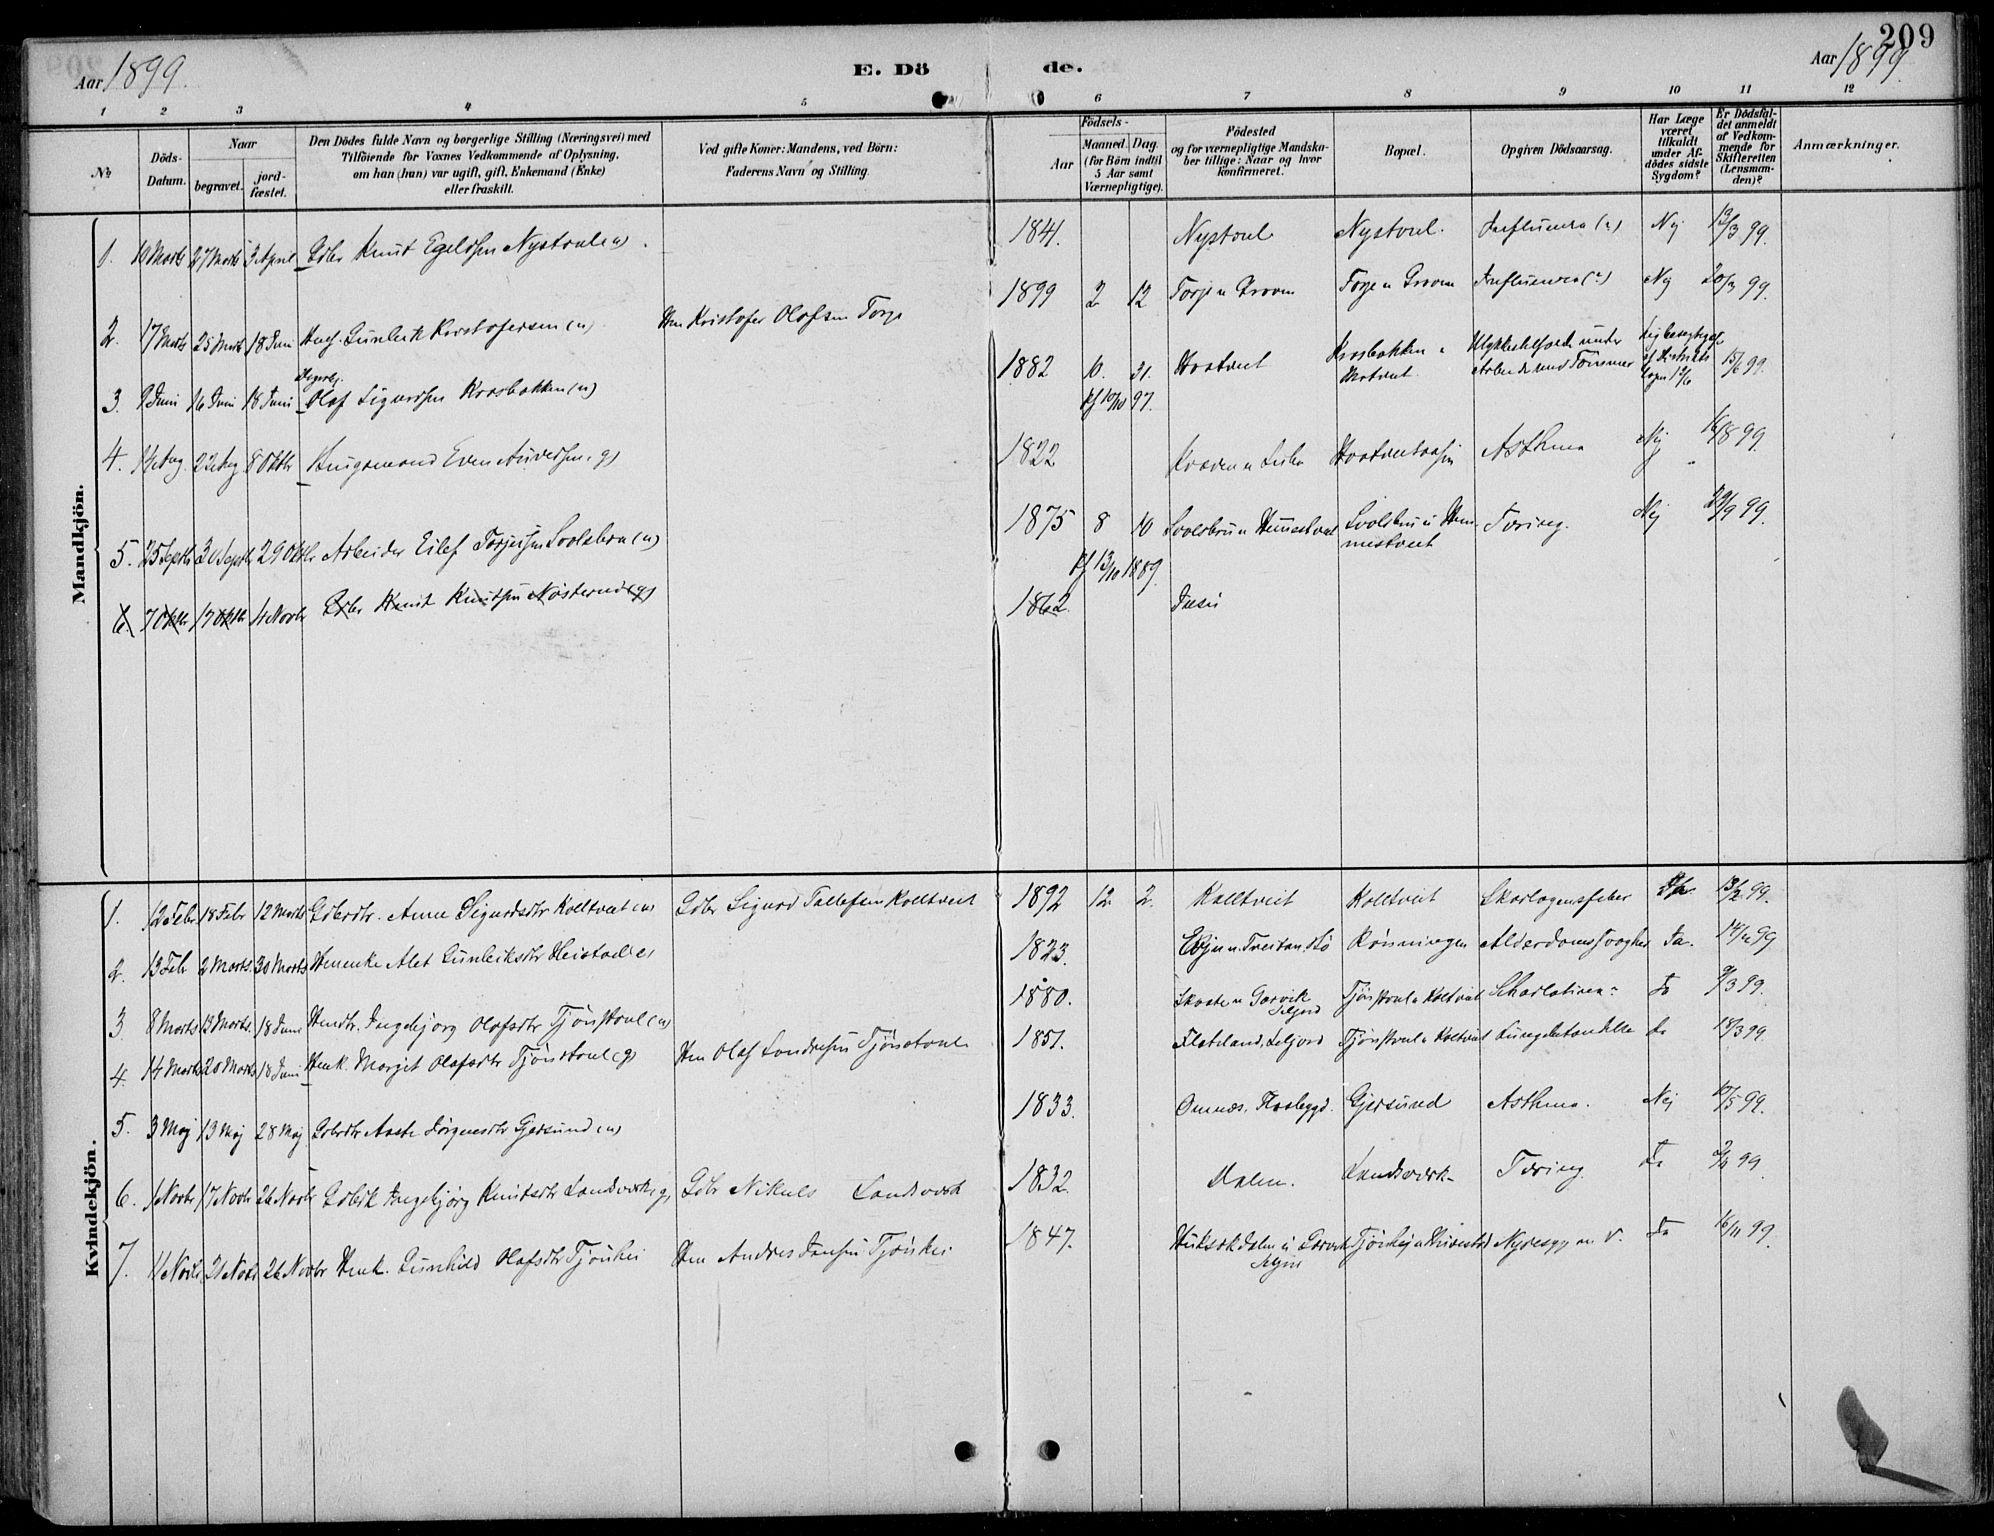 SAKO, Kviteseid kirkebøker, F/Fb/L0002: Ministerialbok nr. II 2, 1882-1916, s. 209